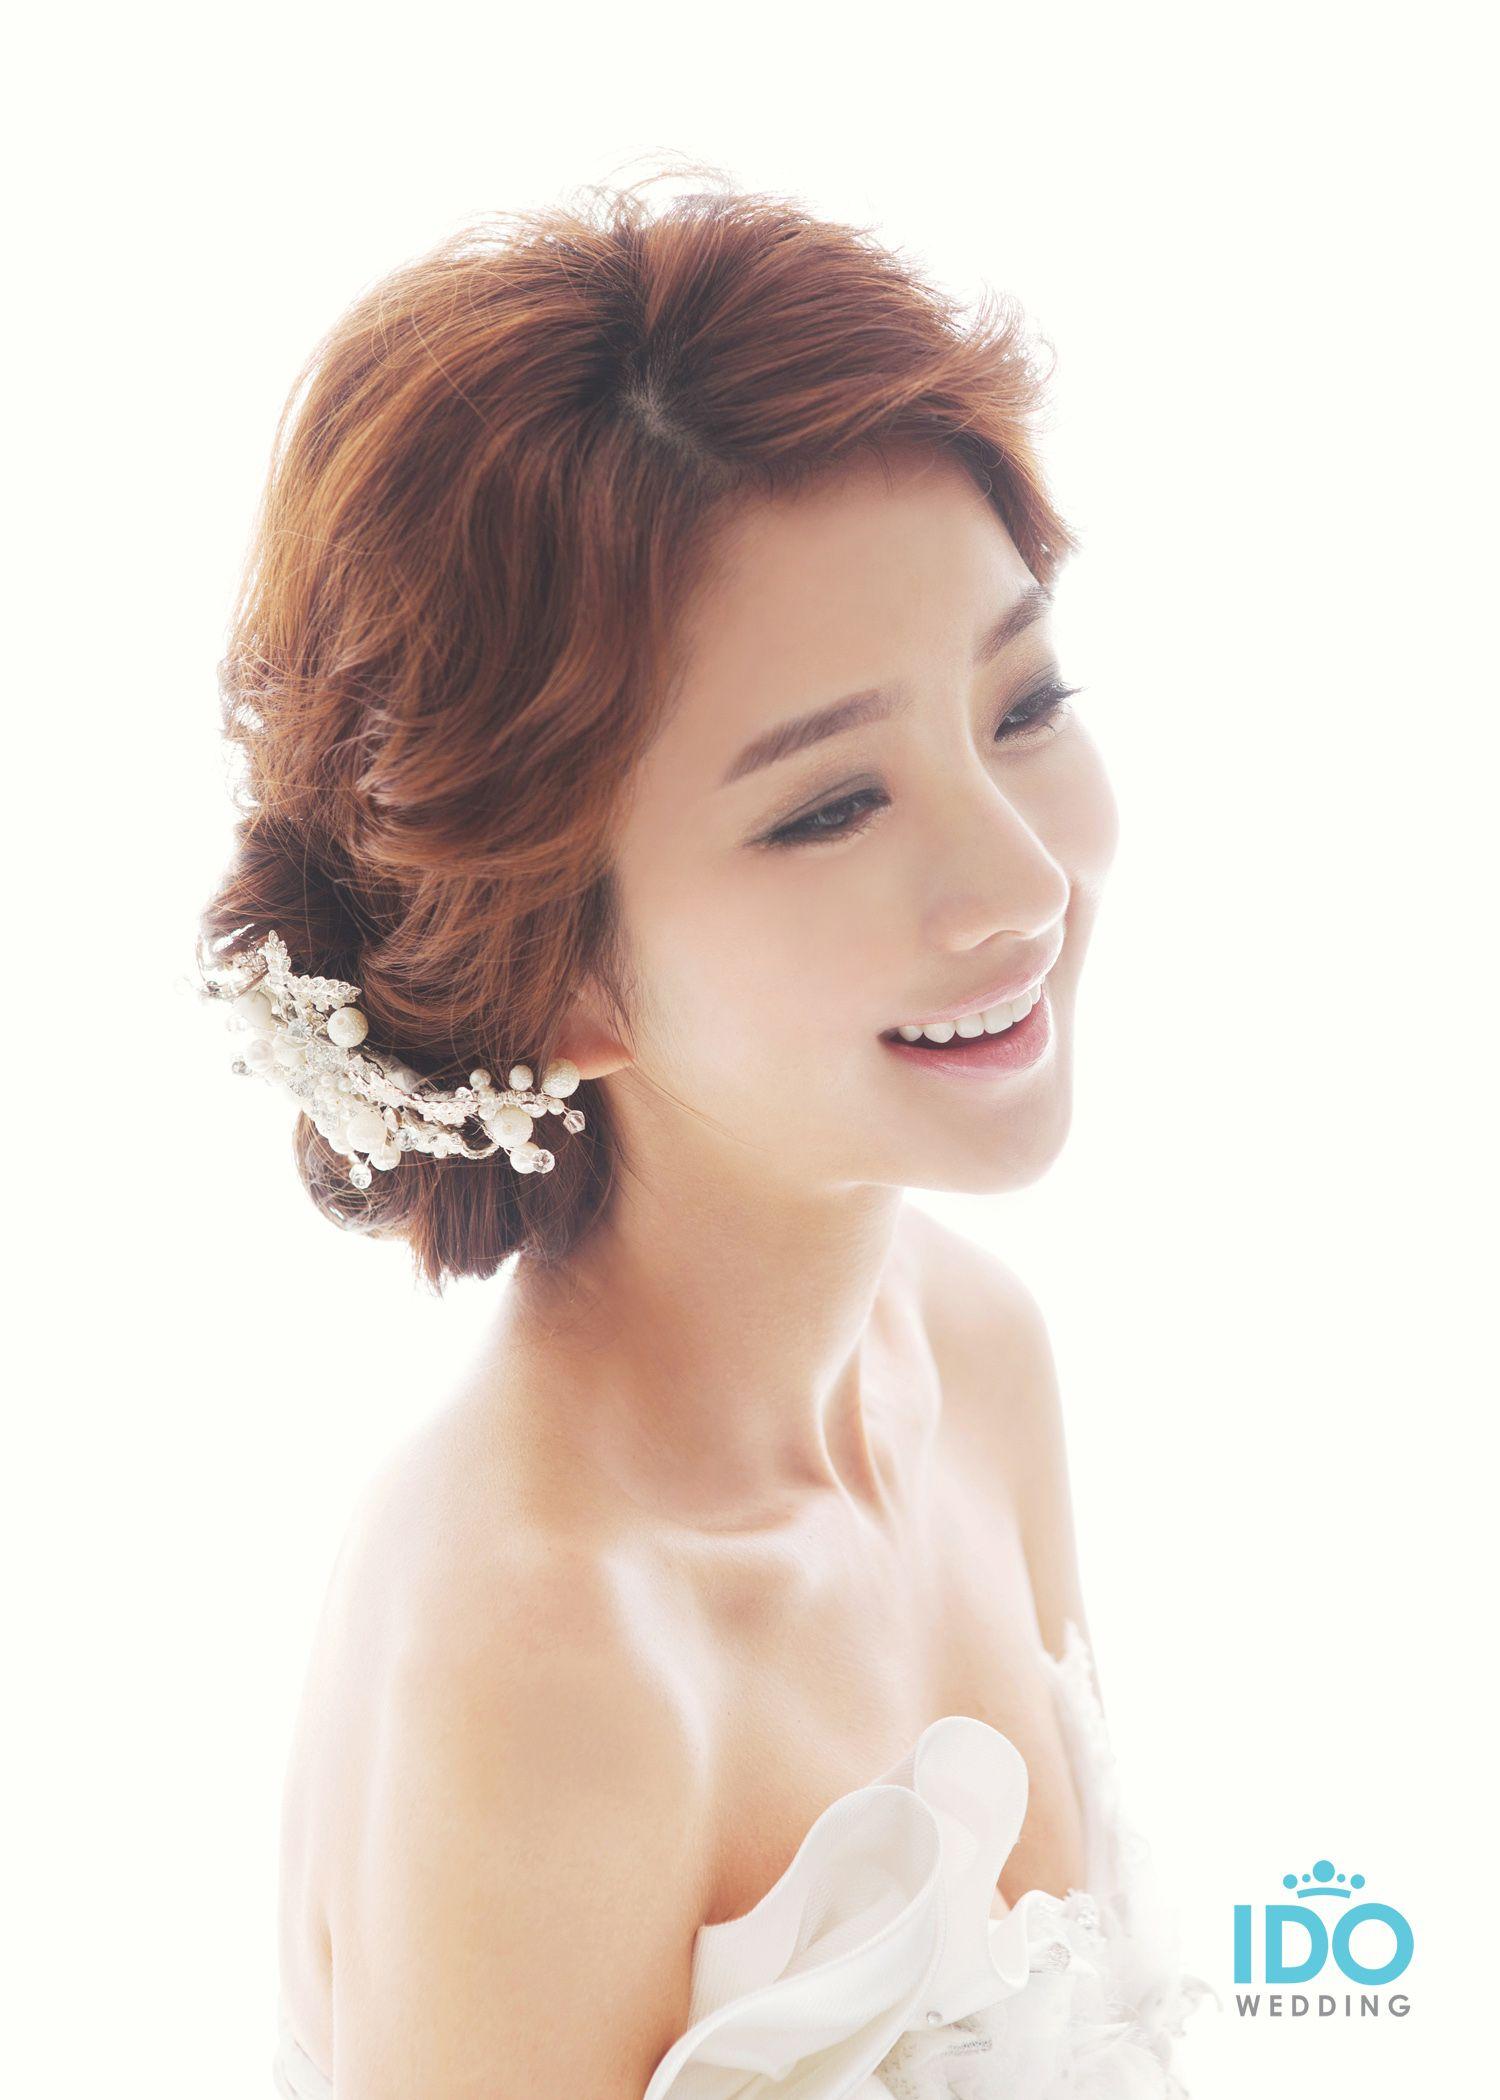 korean wedding photo – hair & makeup style | wedding hair